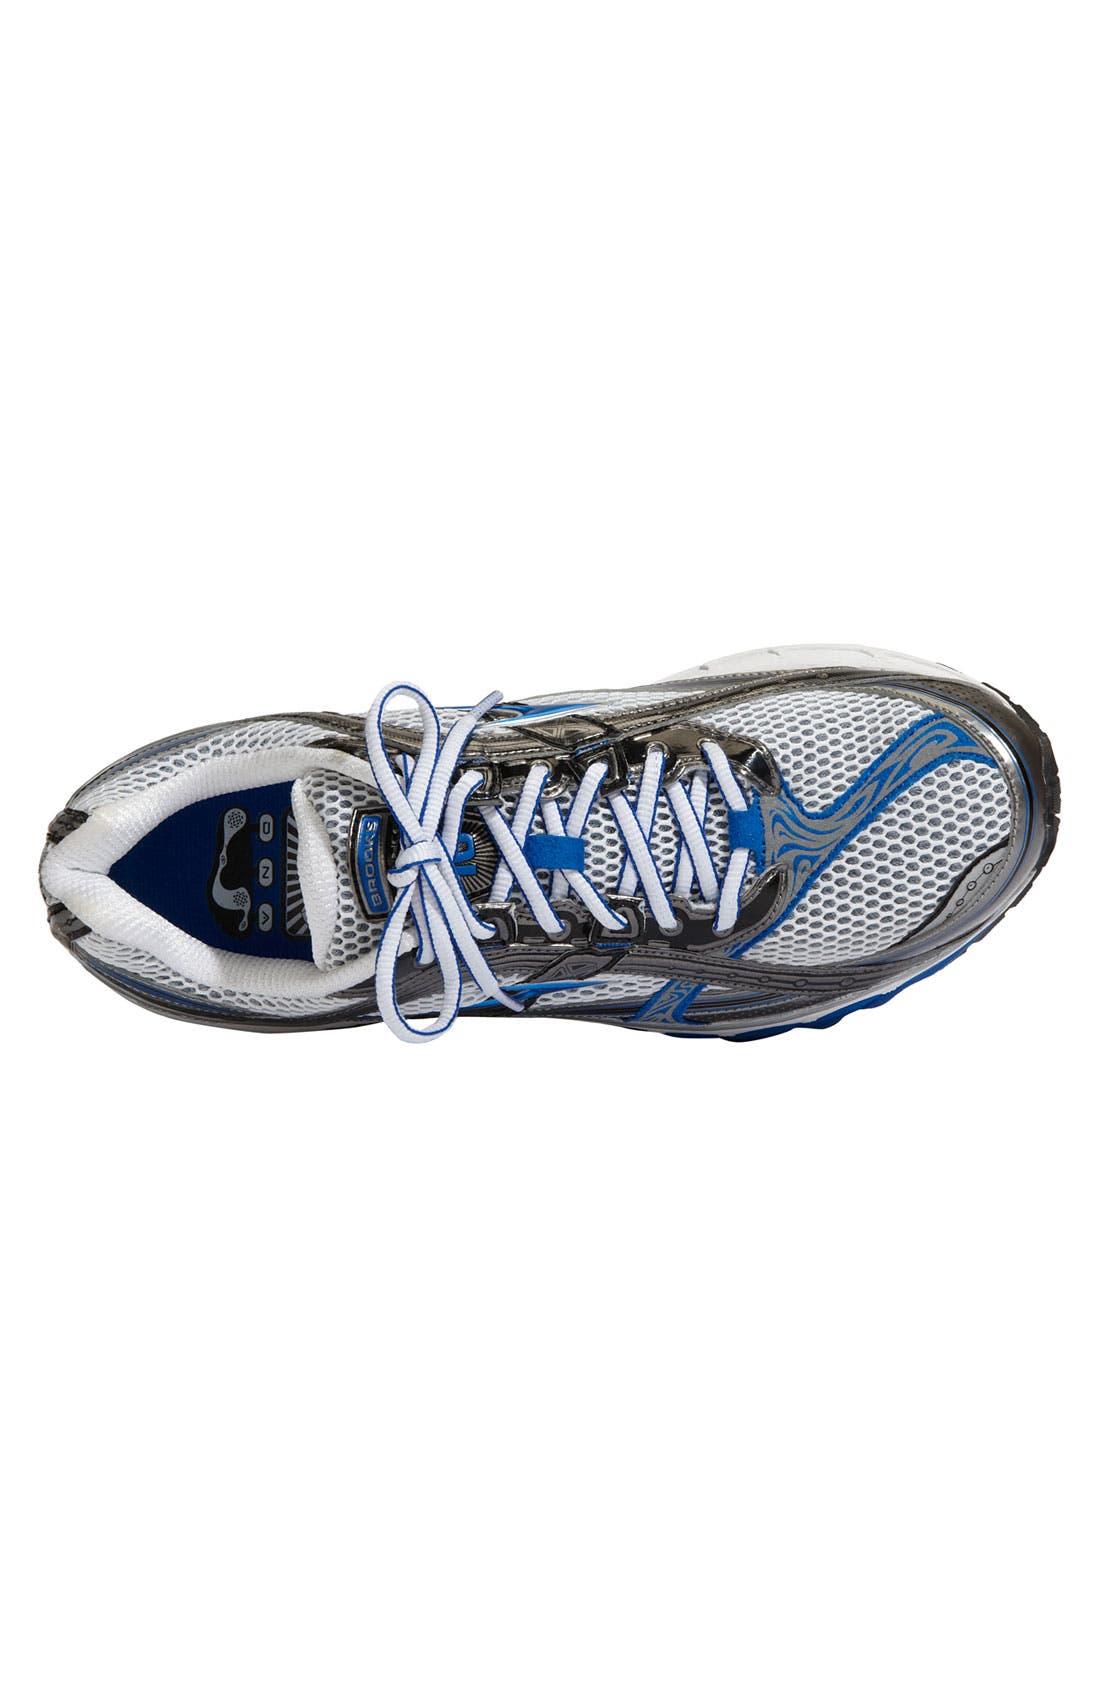 Alternate Image 2  - Brooks 'Trance 10' Running Shoe (Men)